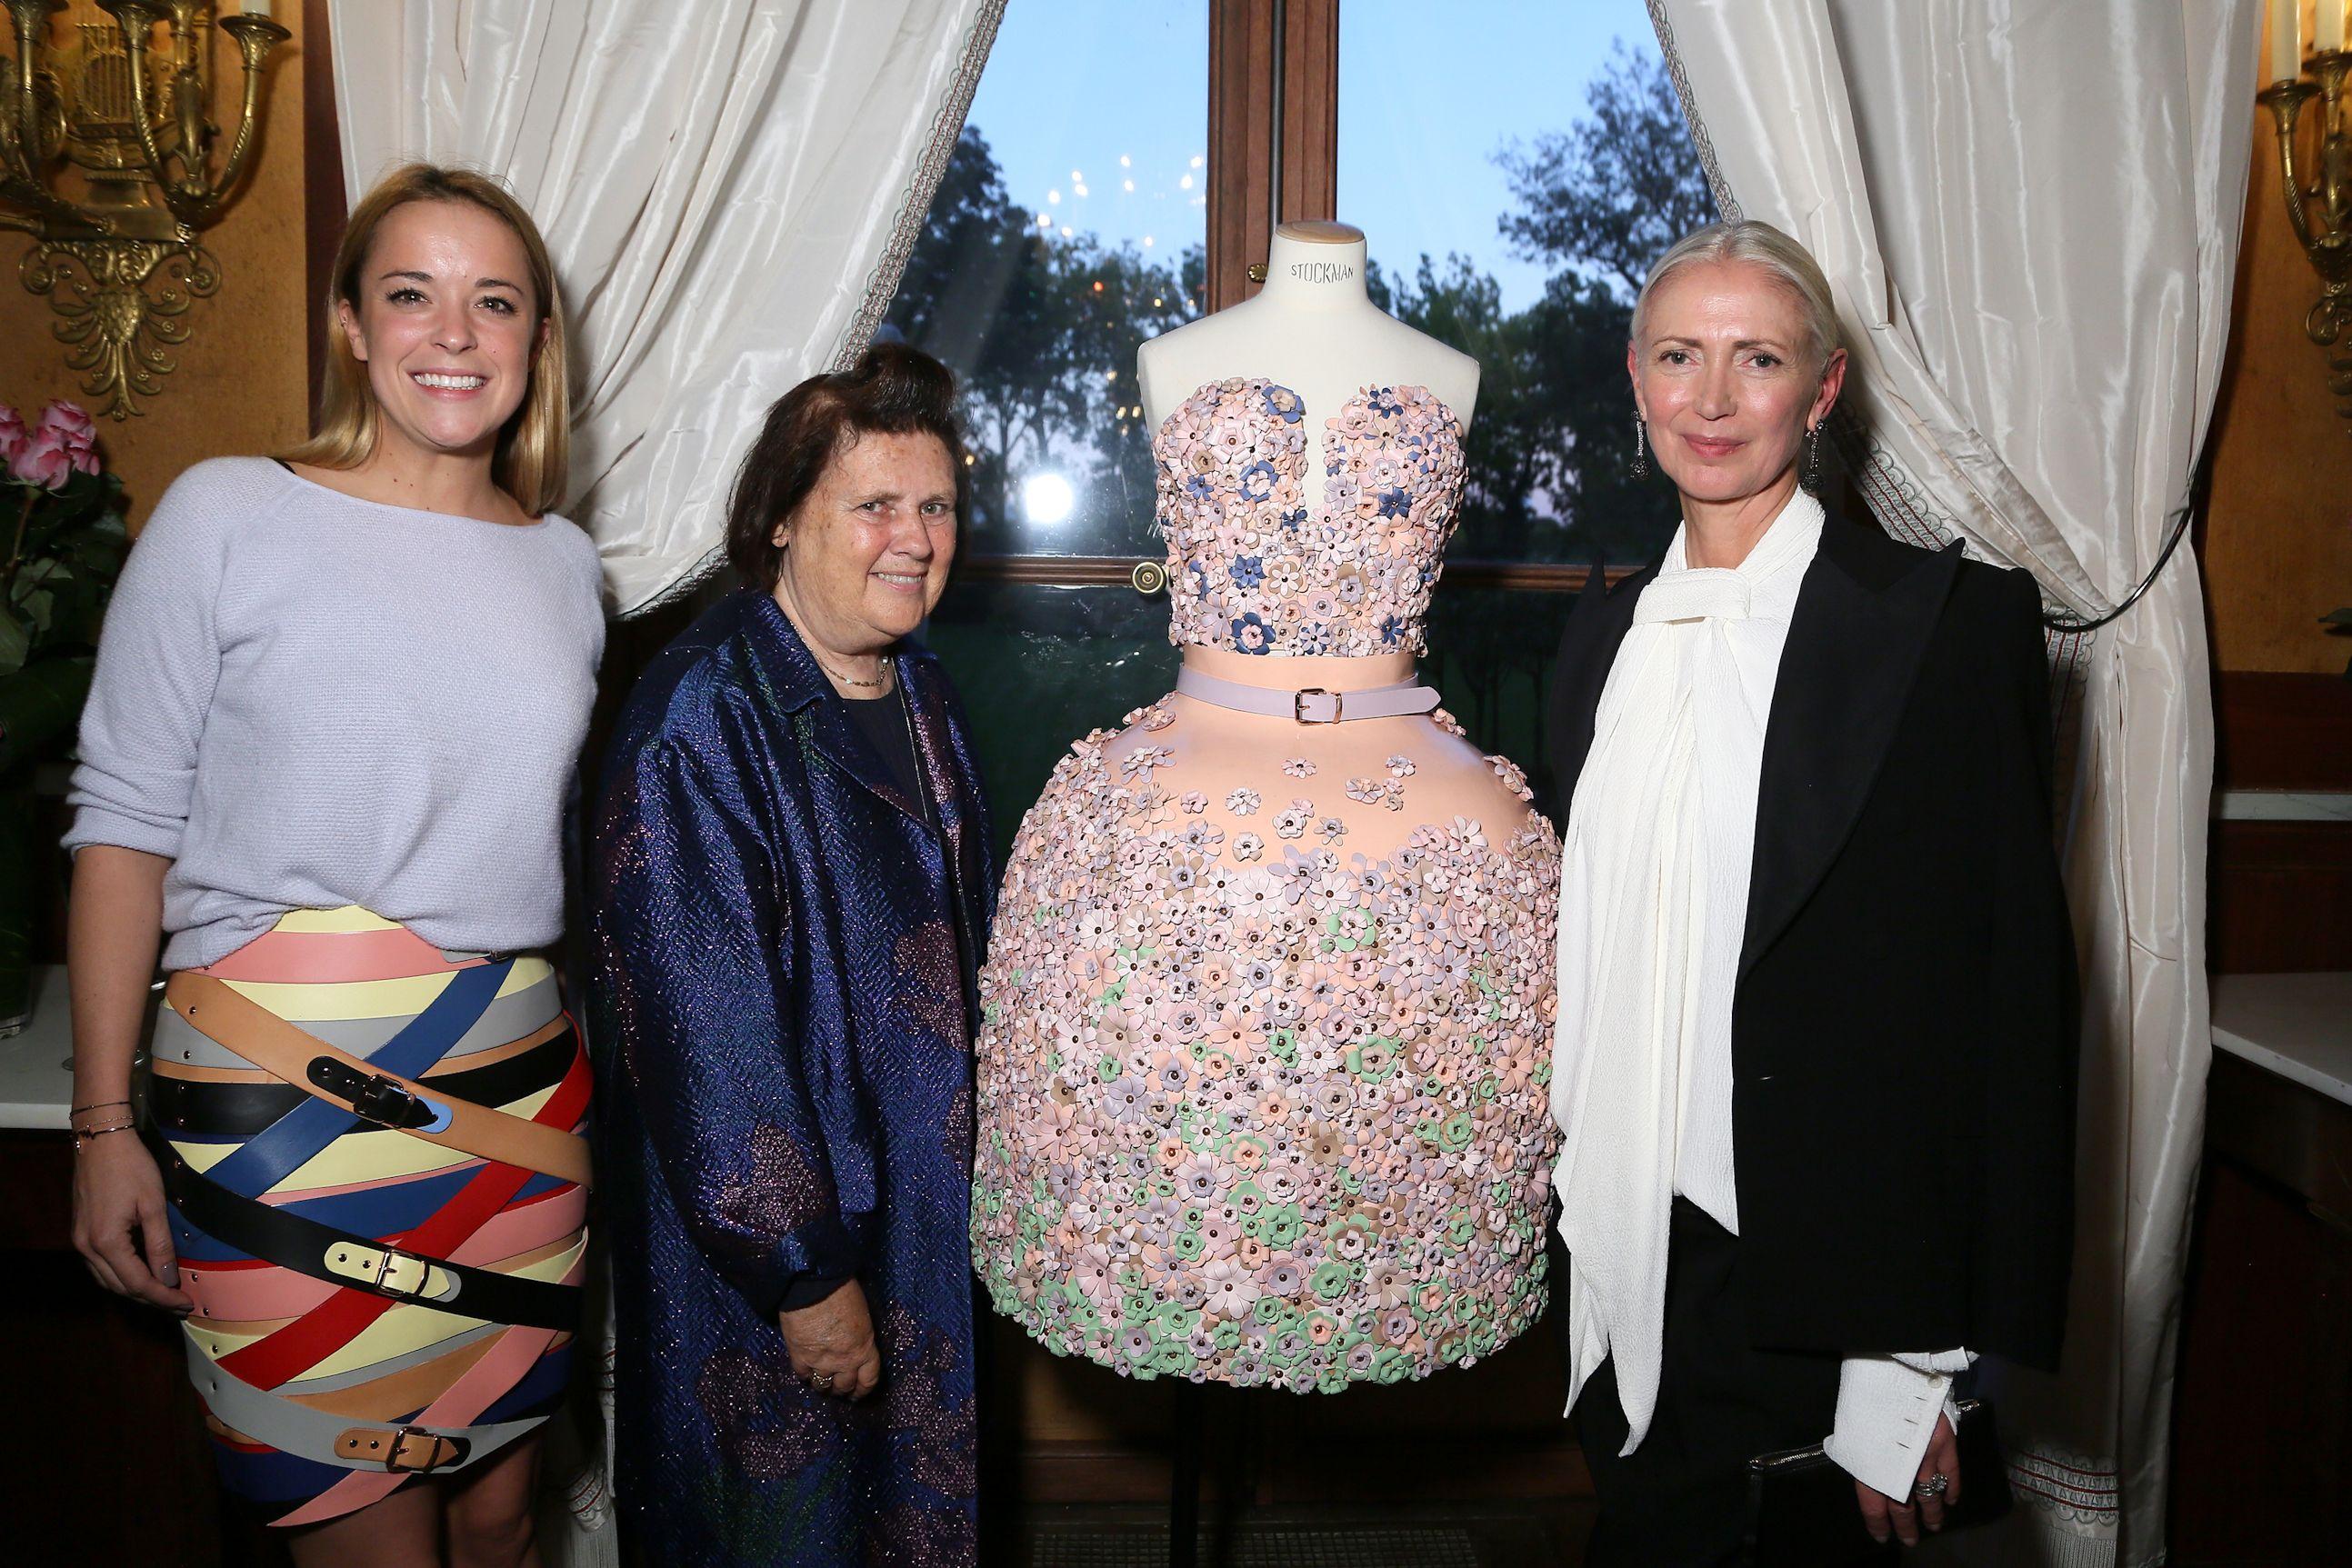 A designer, Suzy Menkes and Christiane Arp attend Der Berliner Mode Salon